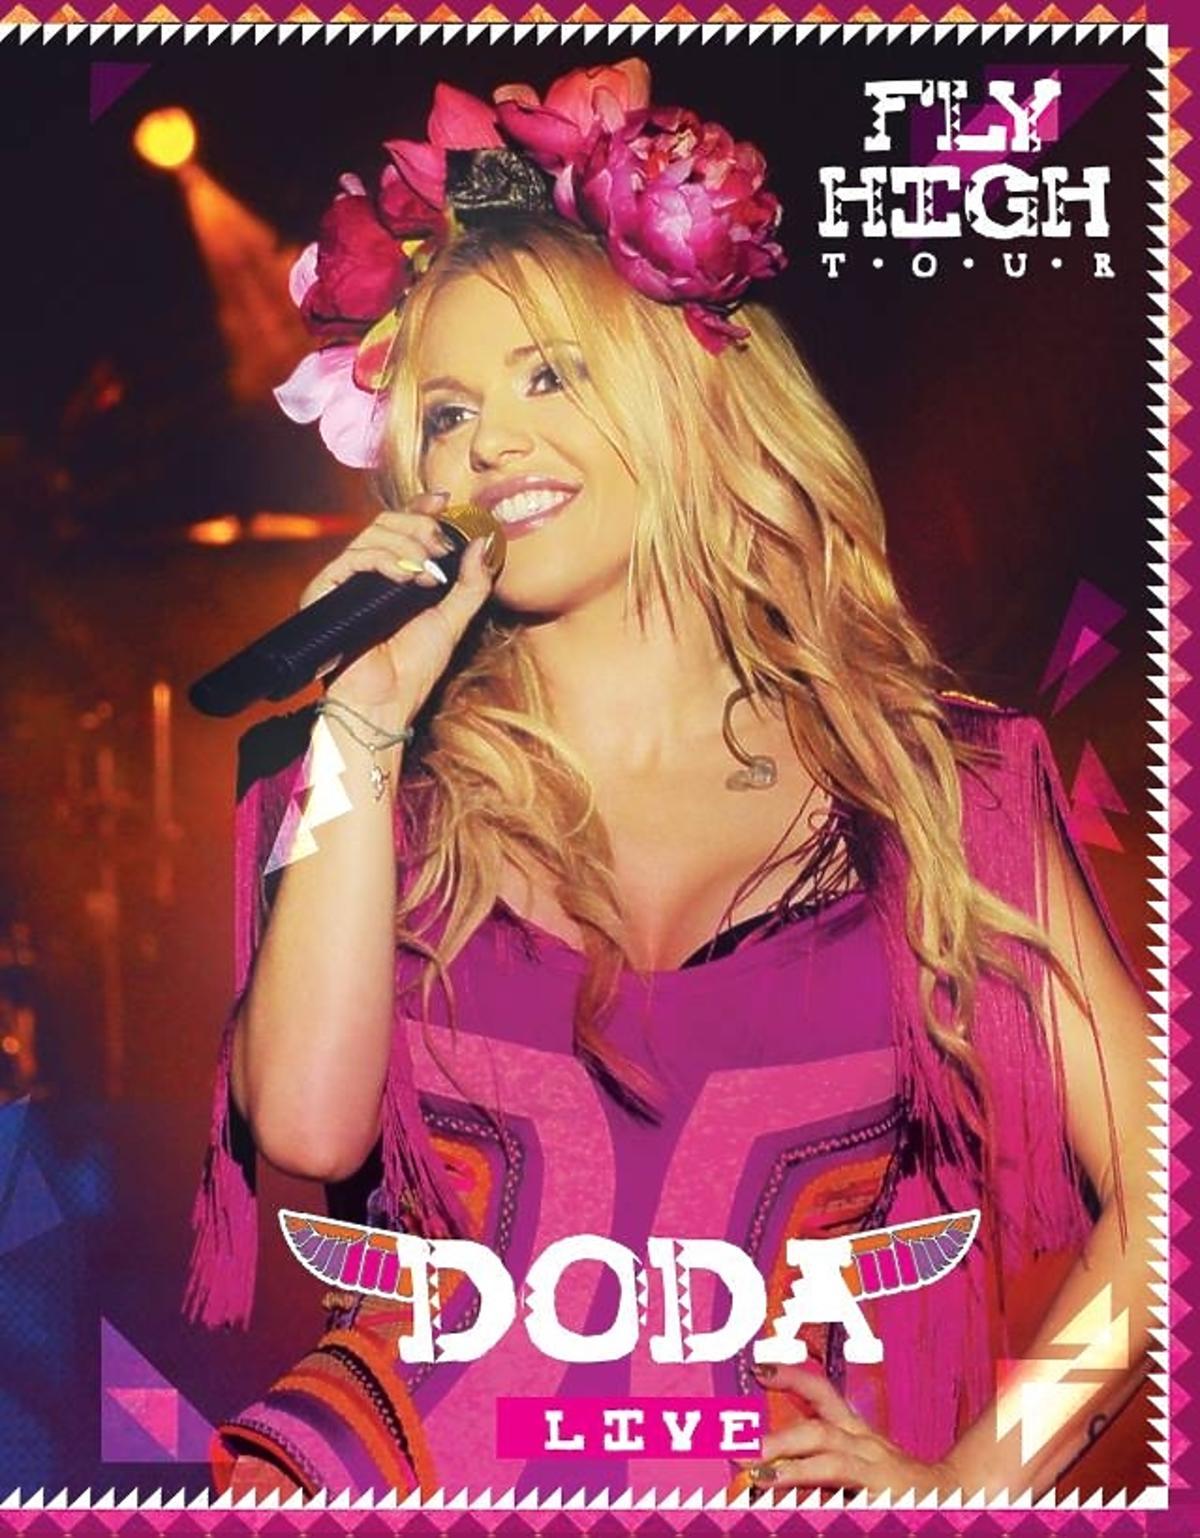 Okładka DVD Dody High Fly Tour